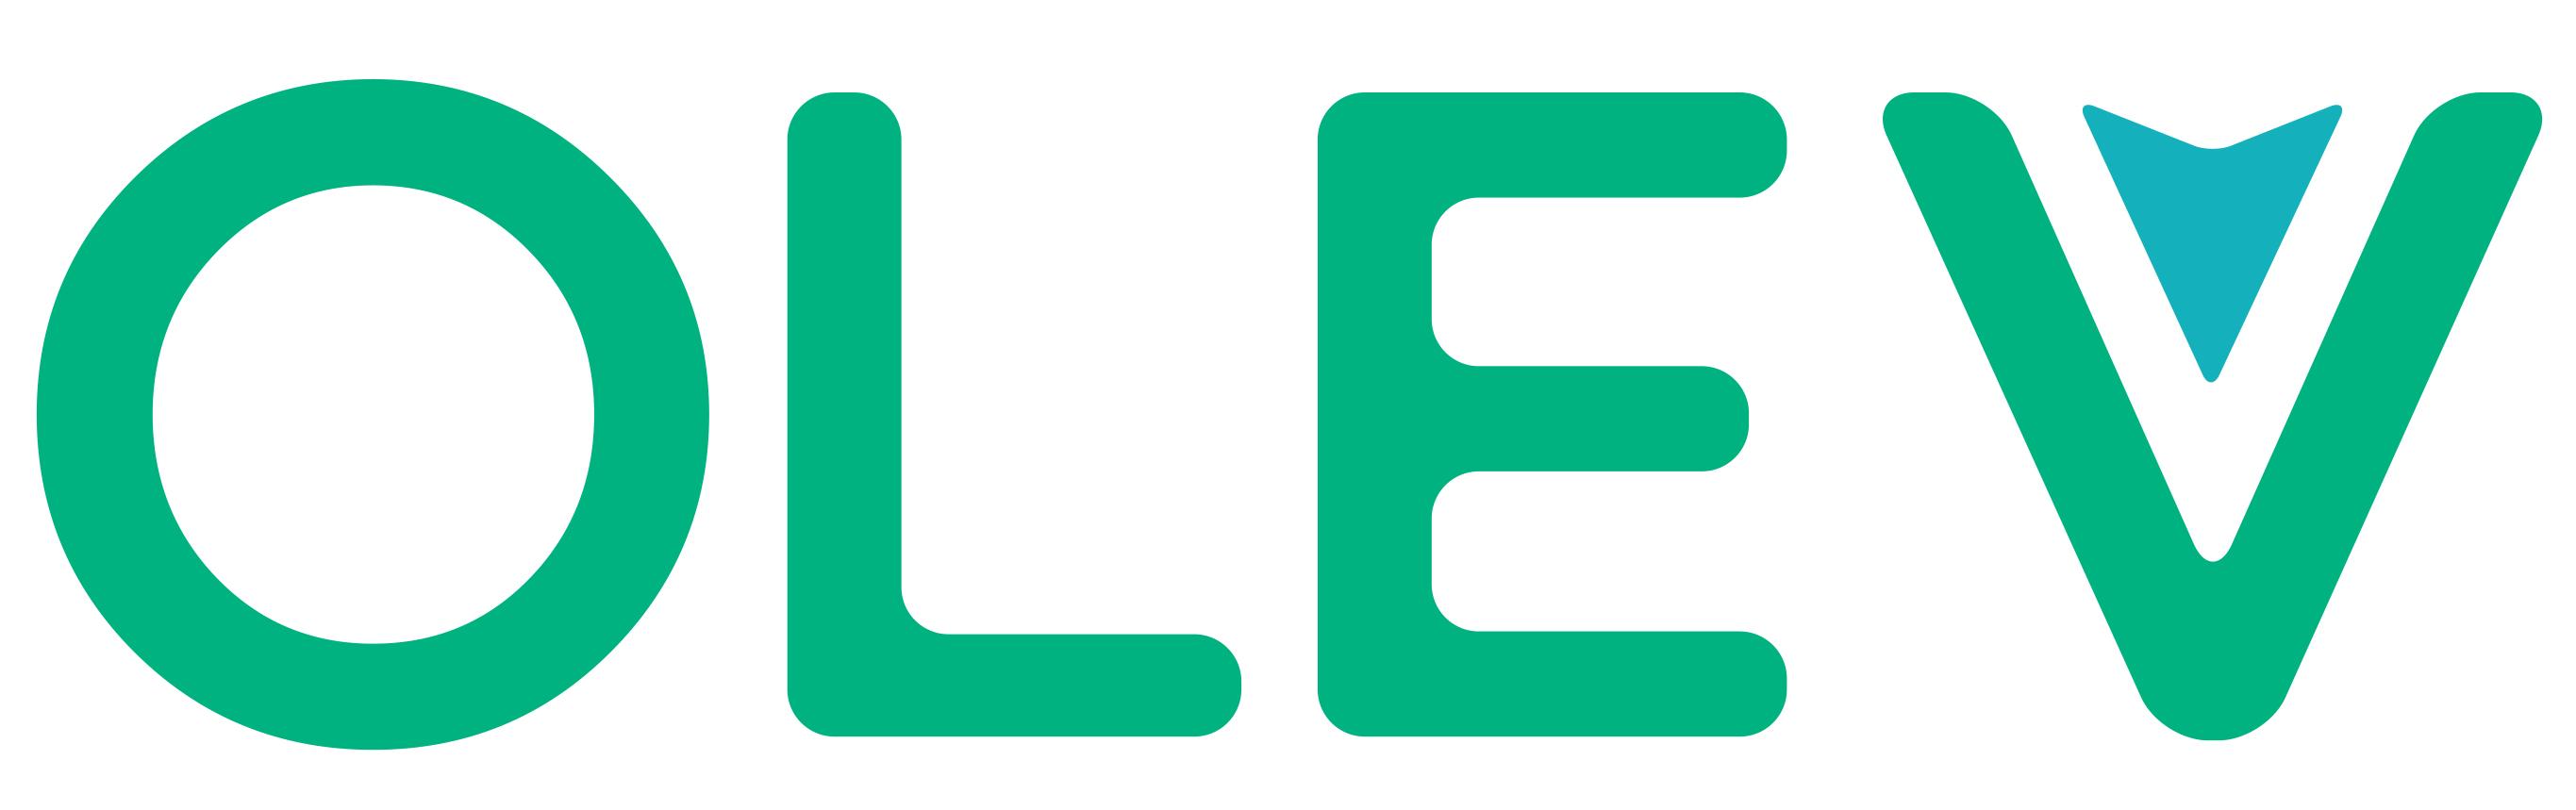 1478866415_olev_logo